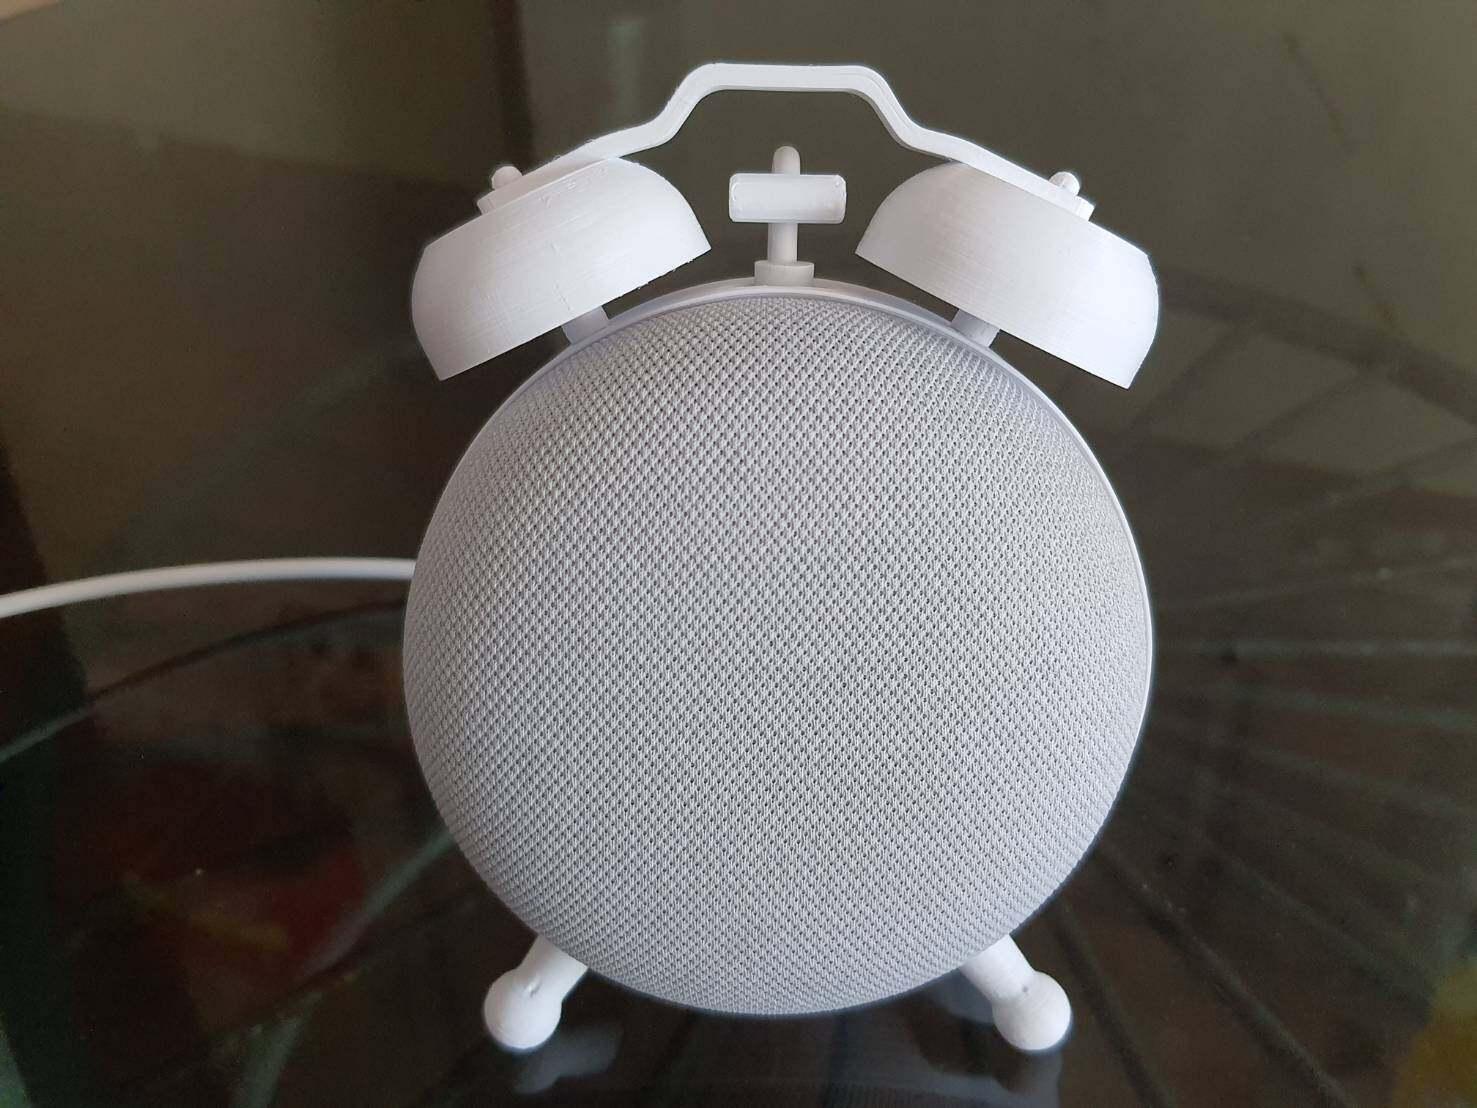 Cover case สำหรับ Google Home mini stand / google nest mini / google nest mini 2/stand กรอบ รูปทรงนาฬิกา google Home mini case google nest case